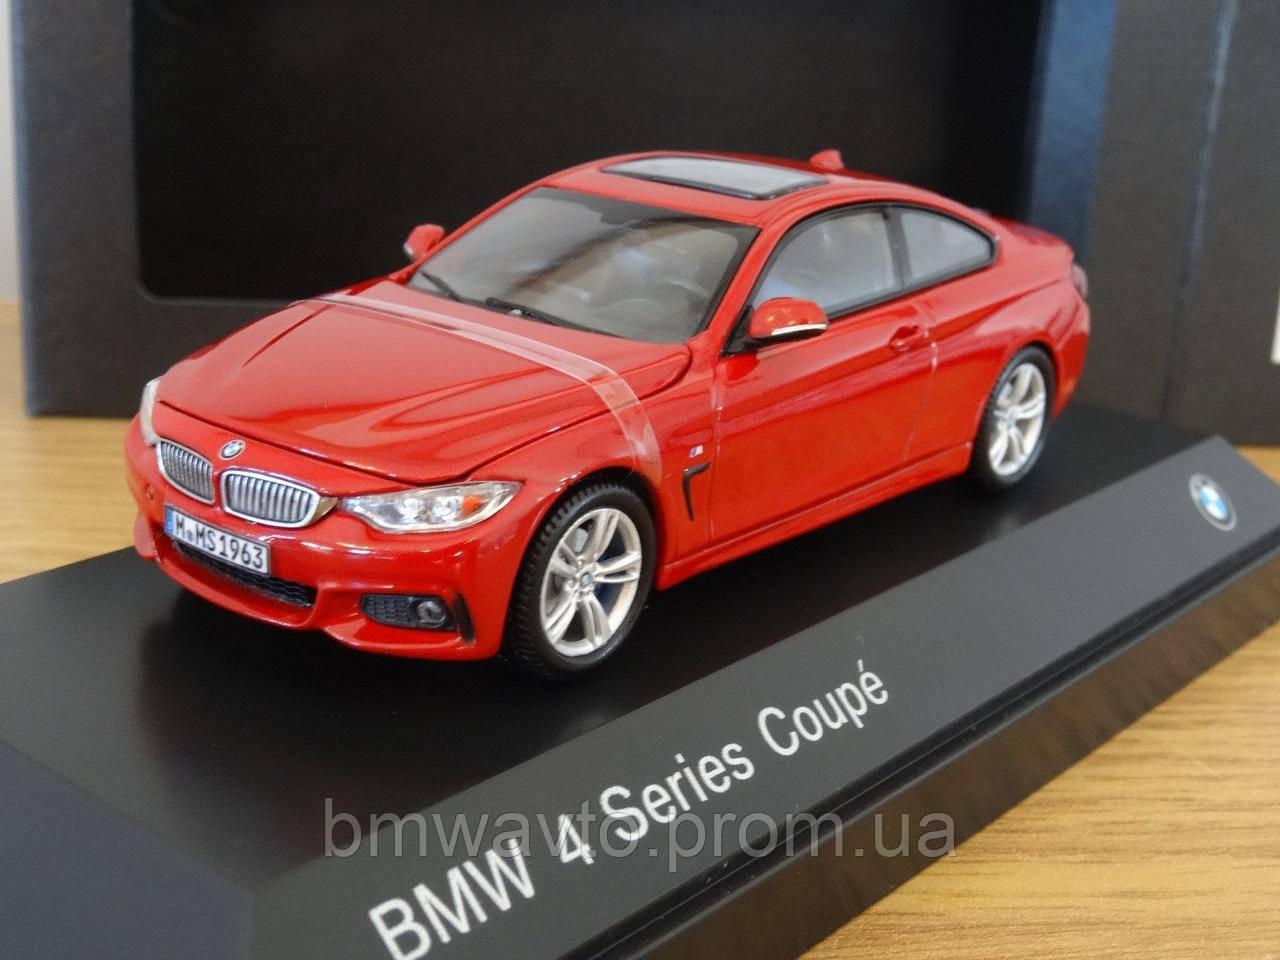 Модель автомобиля BMW 4 серии Купе (F32) Снята с производства!